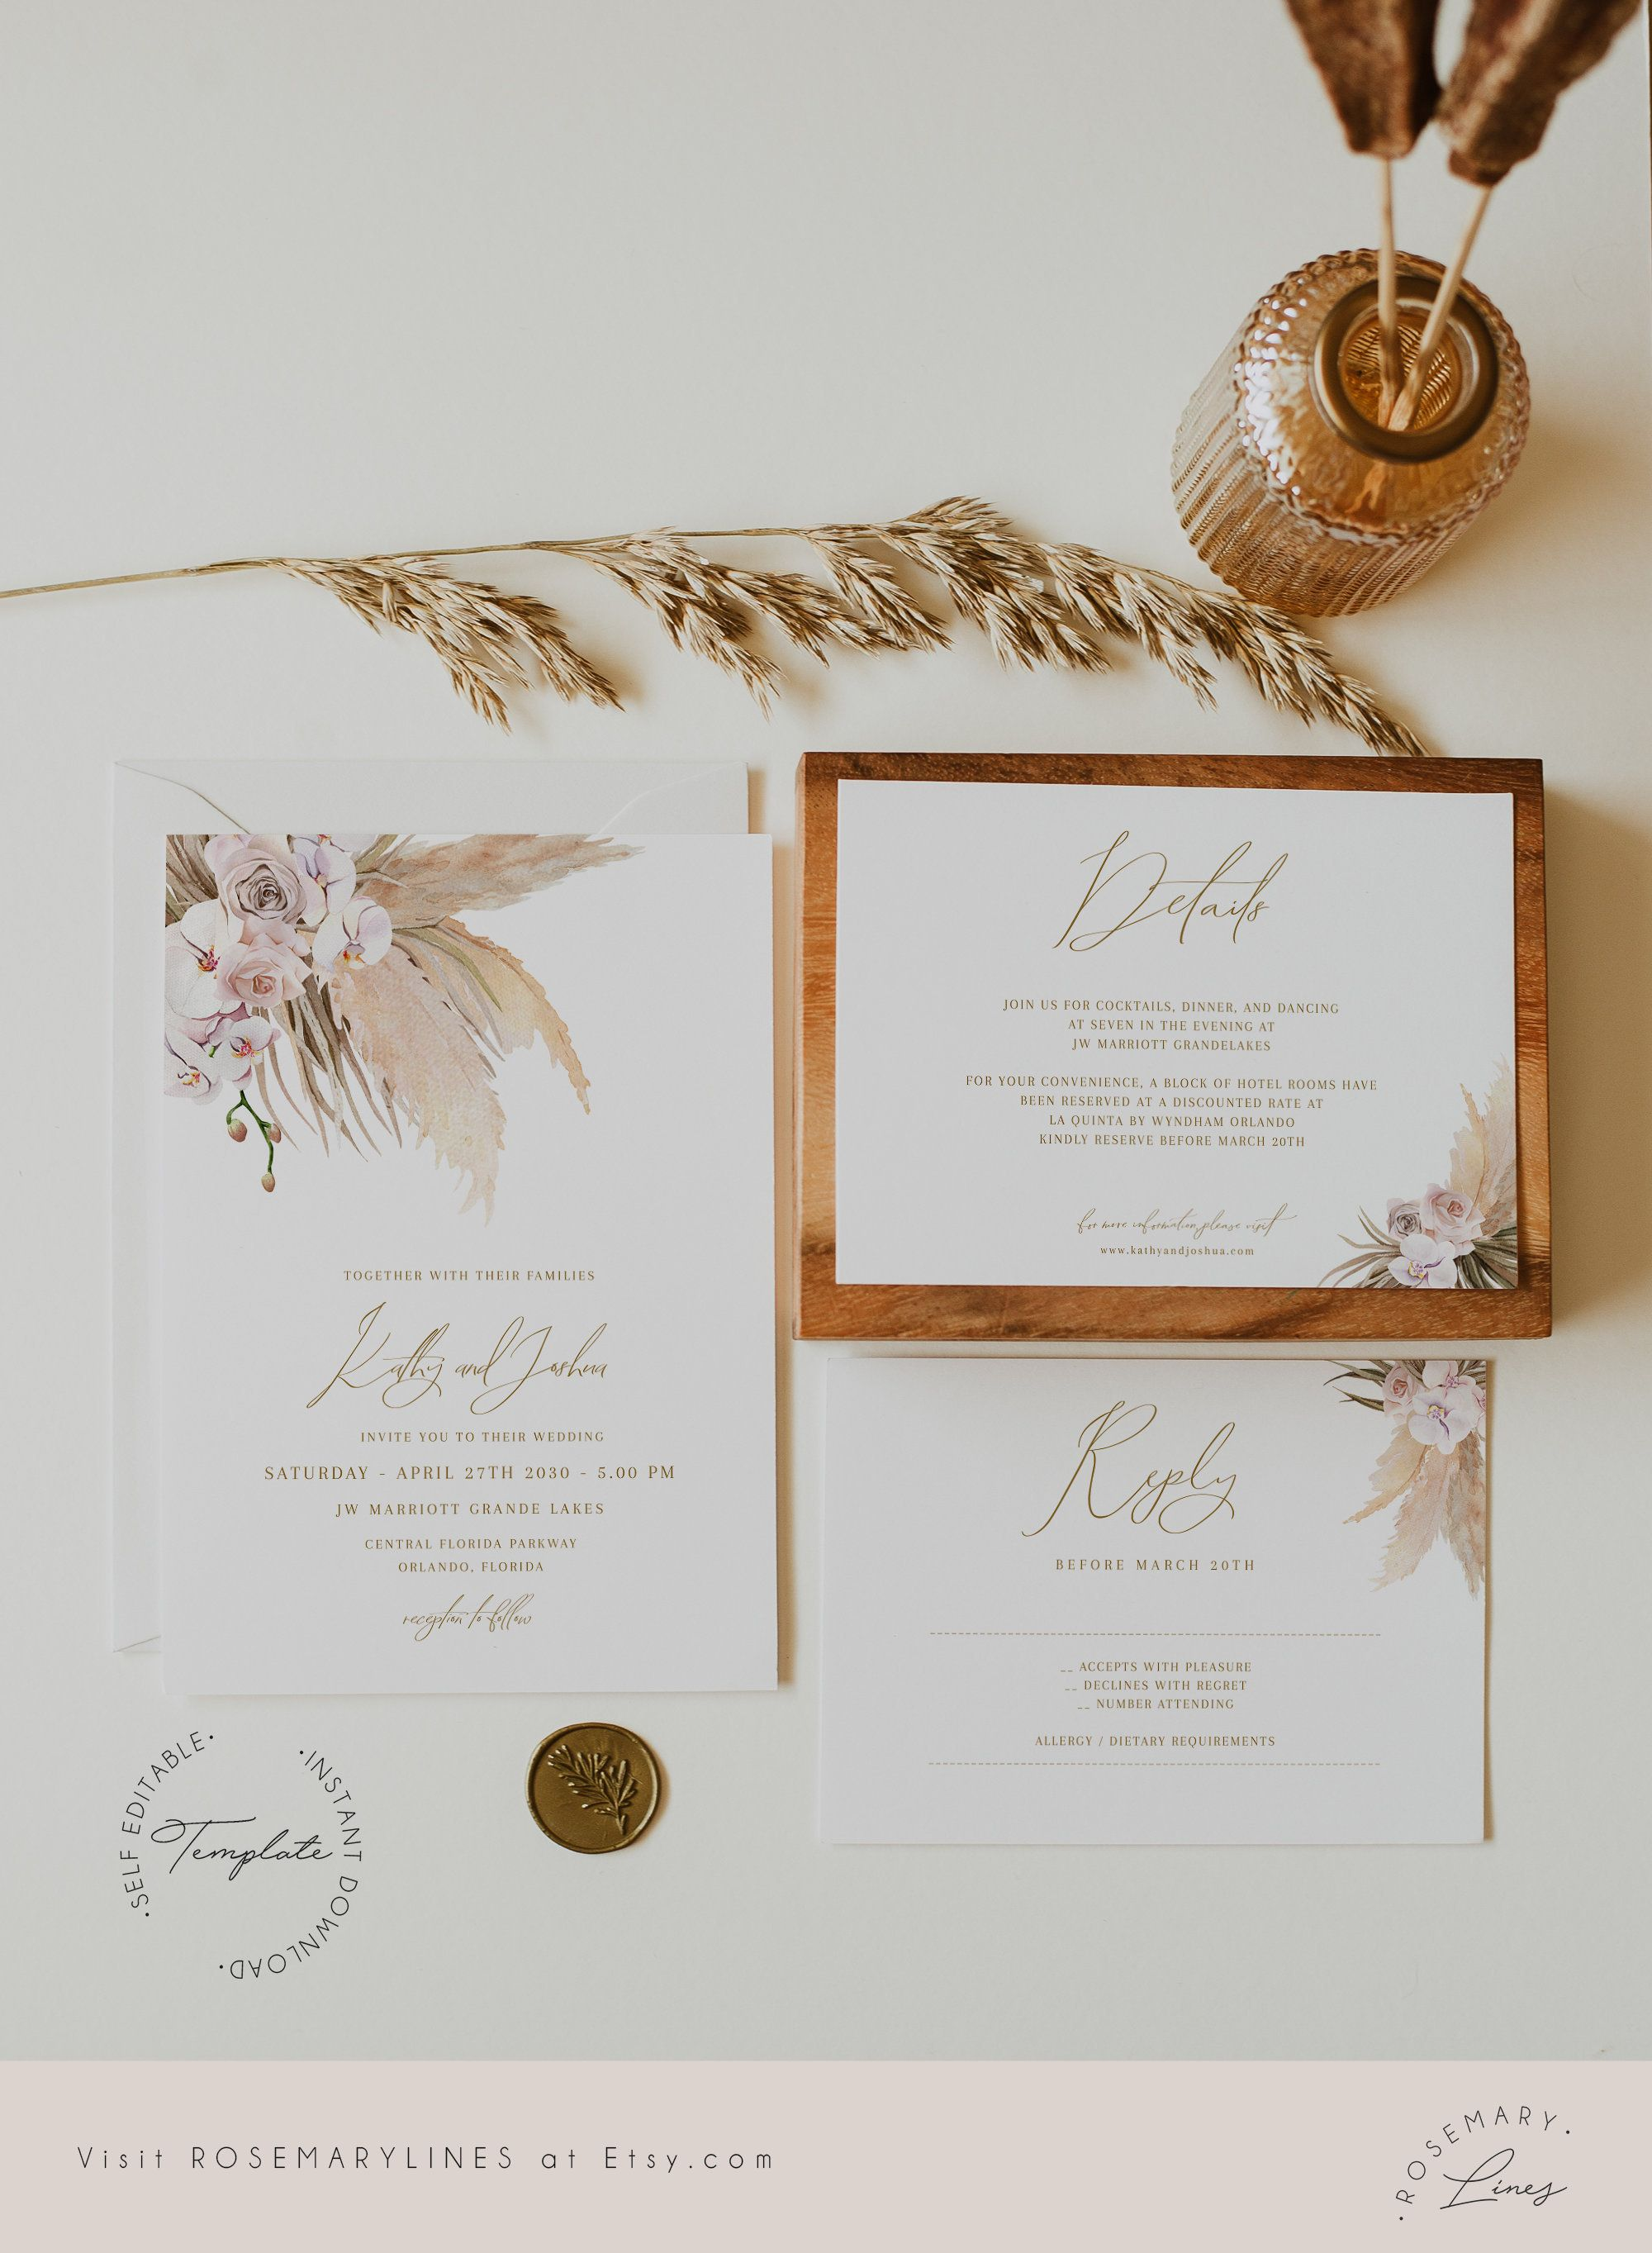 Pampas Grass Wedding Invitation Template Boho Wedding Invite Etsy Wedding Invitations Boho Desert Wedding Invitation Creative Wedding Invitations